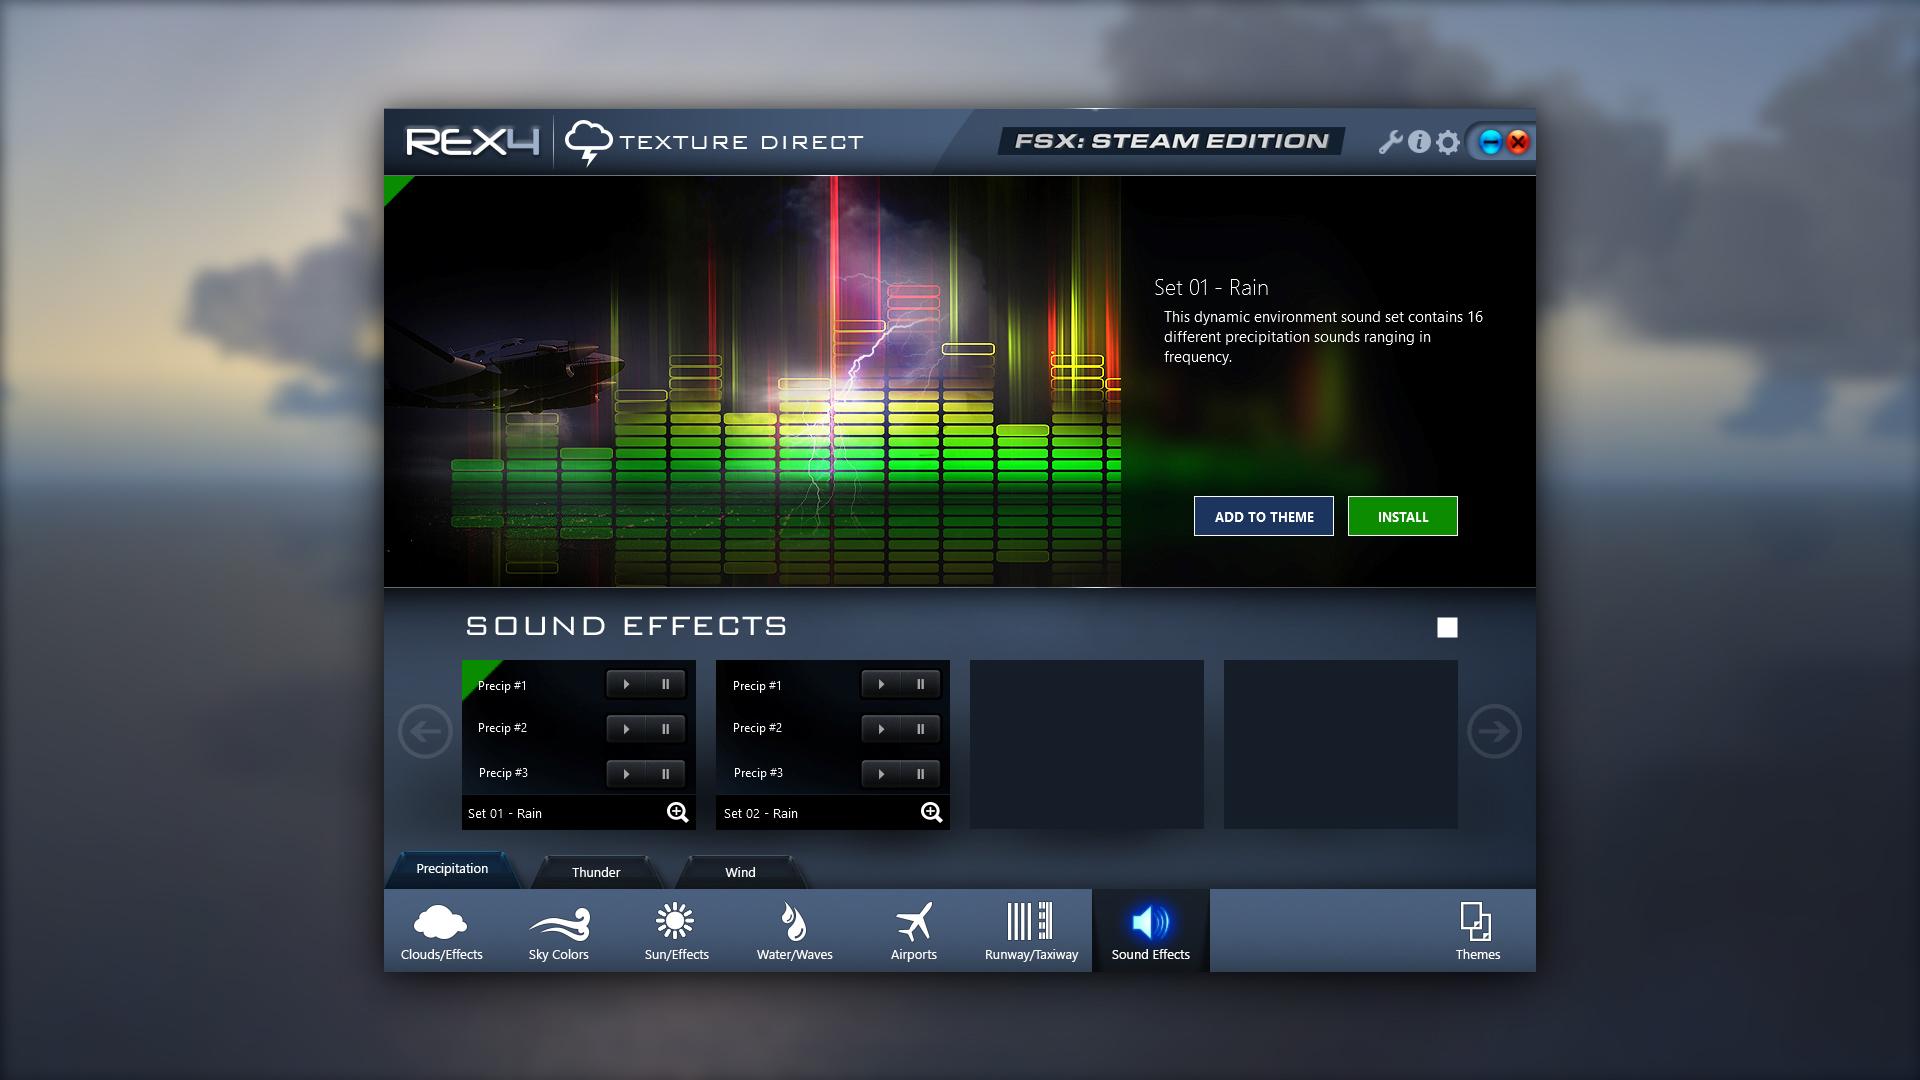 FSX: Steam Edition - REX 4 Texture Direct Enhanced Edition Add-On